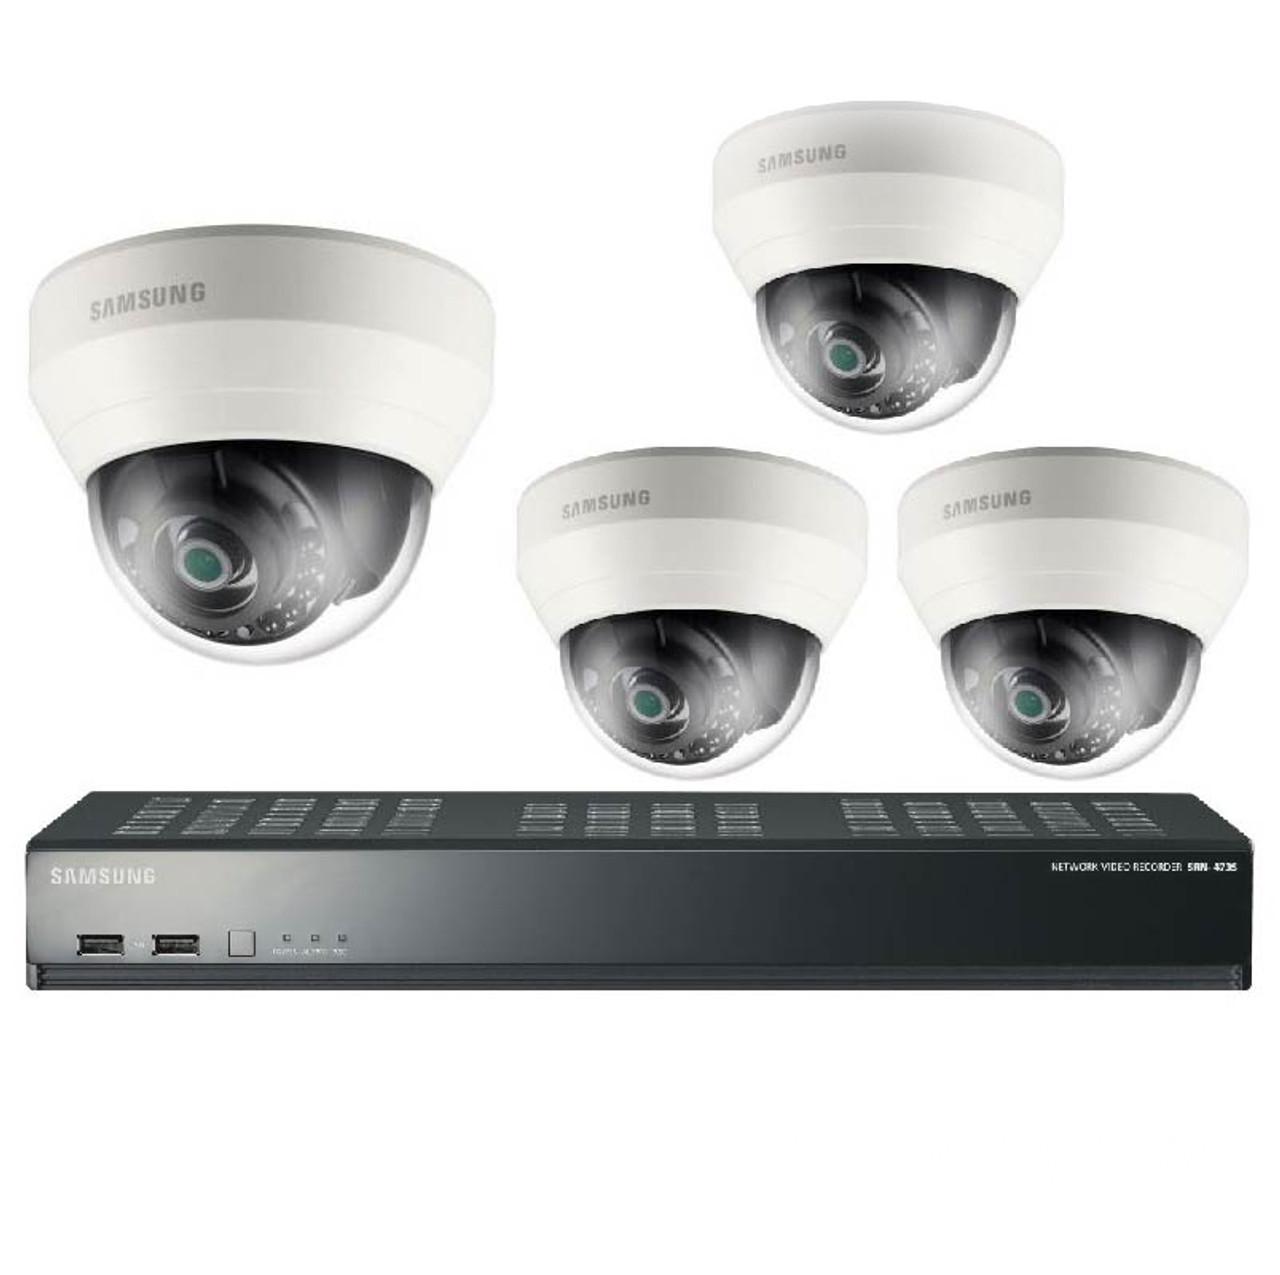 Samsung Srk 3040s 4 Camera 1tb Pre Installed Dome Ip